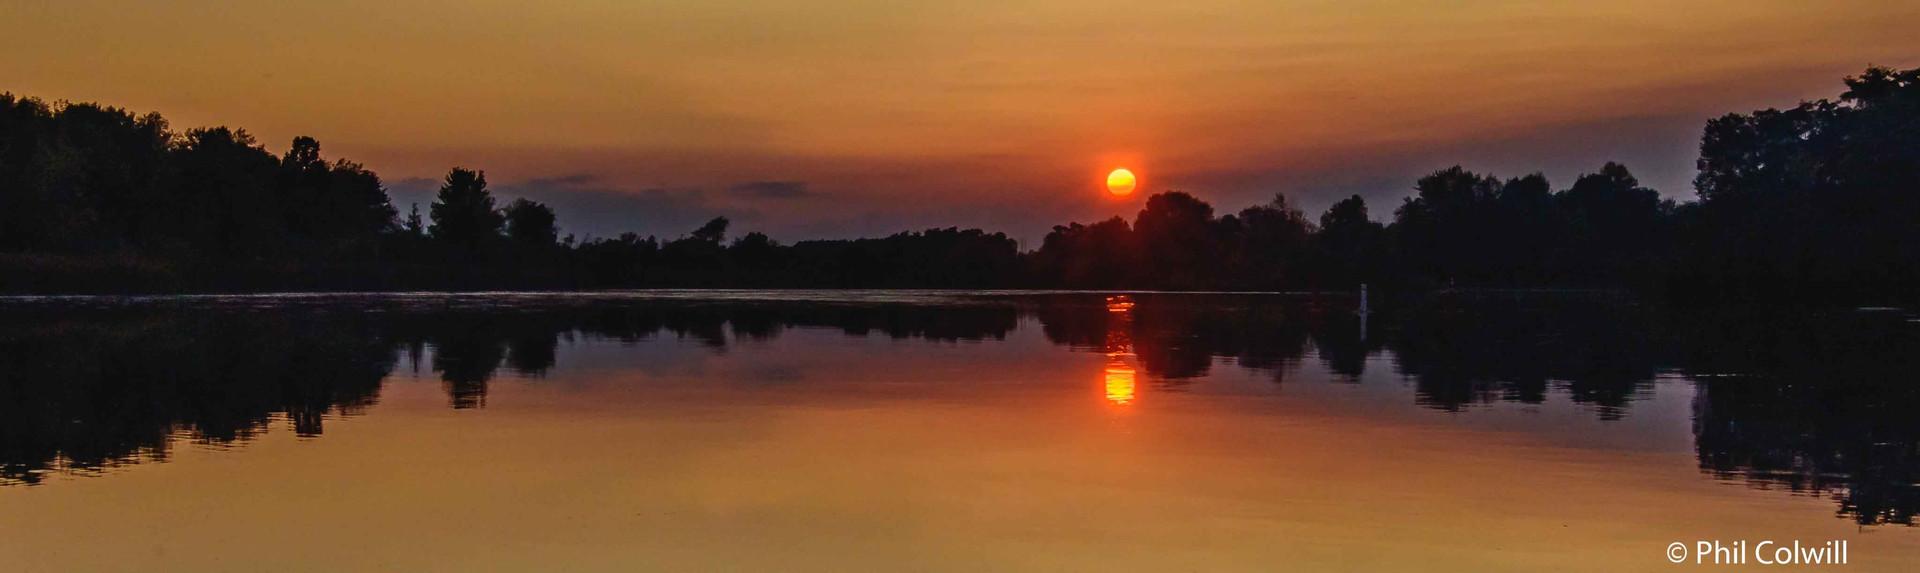 MERRICKVILLE BASIN SUNSET